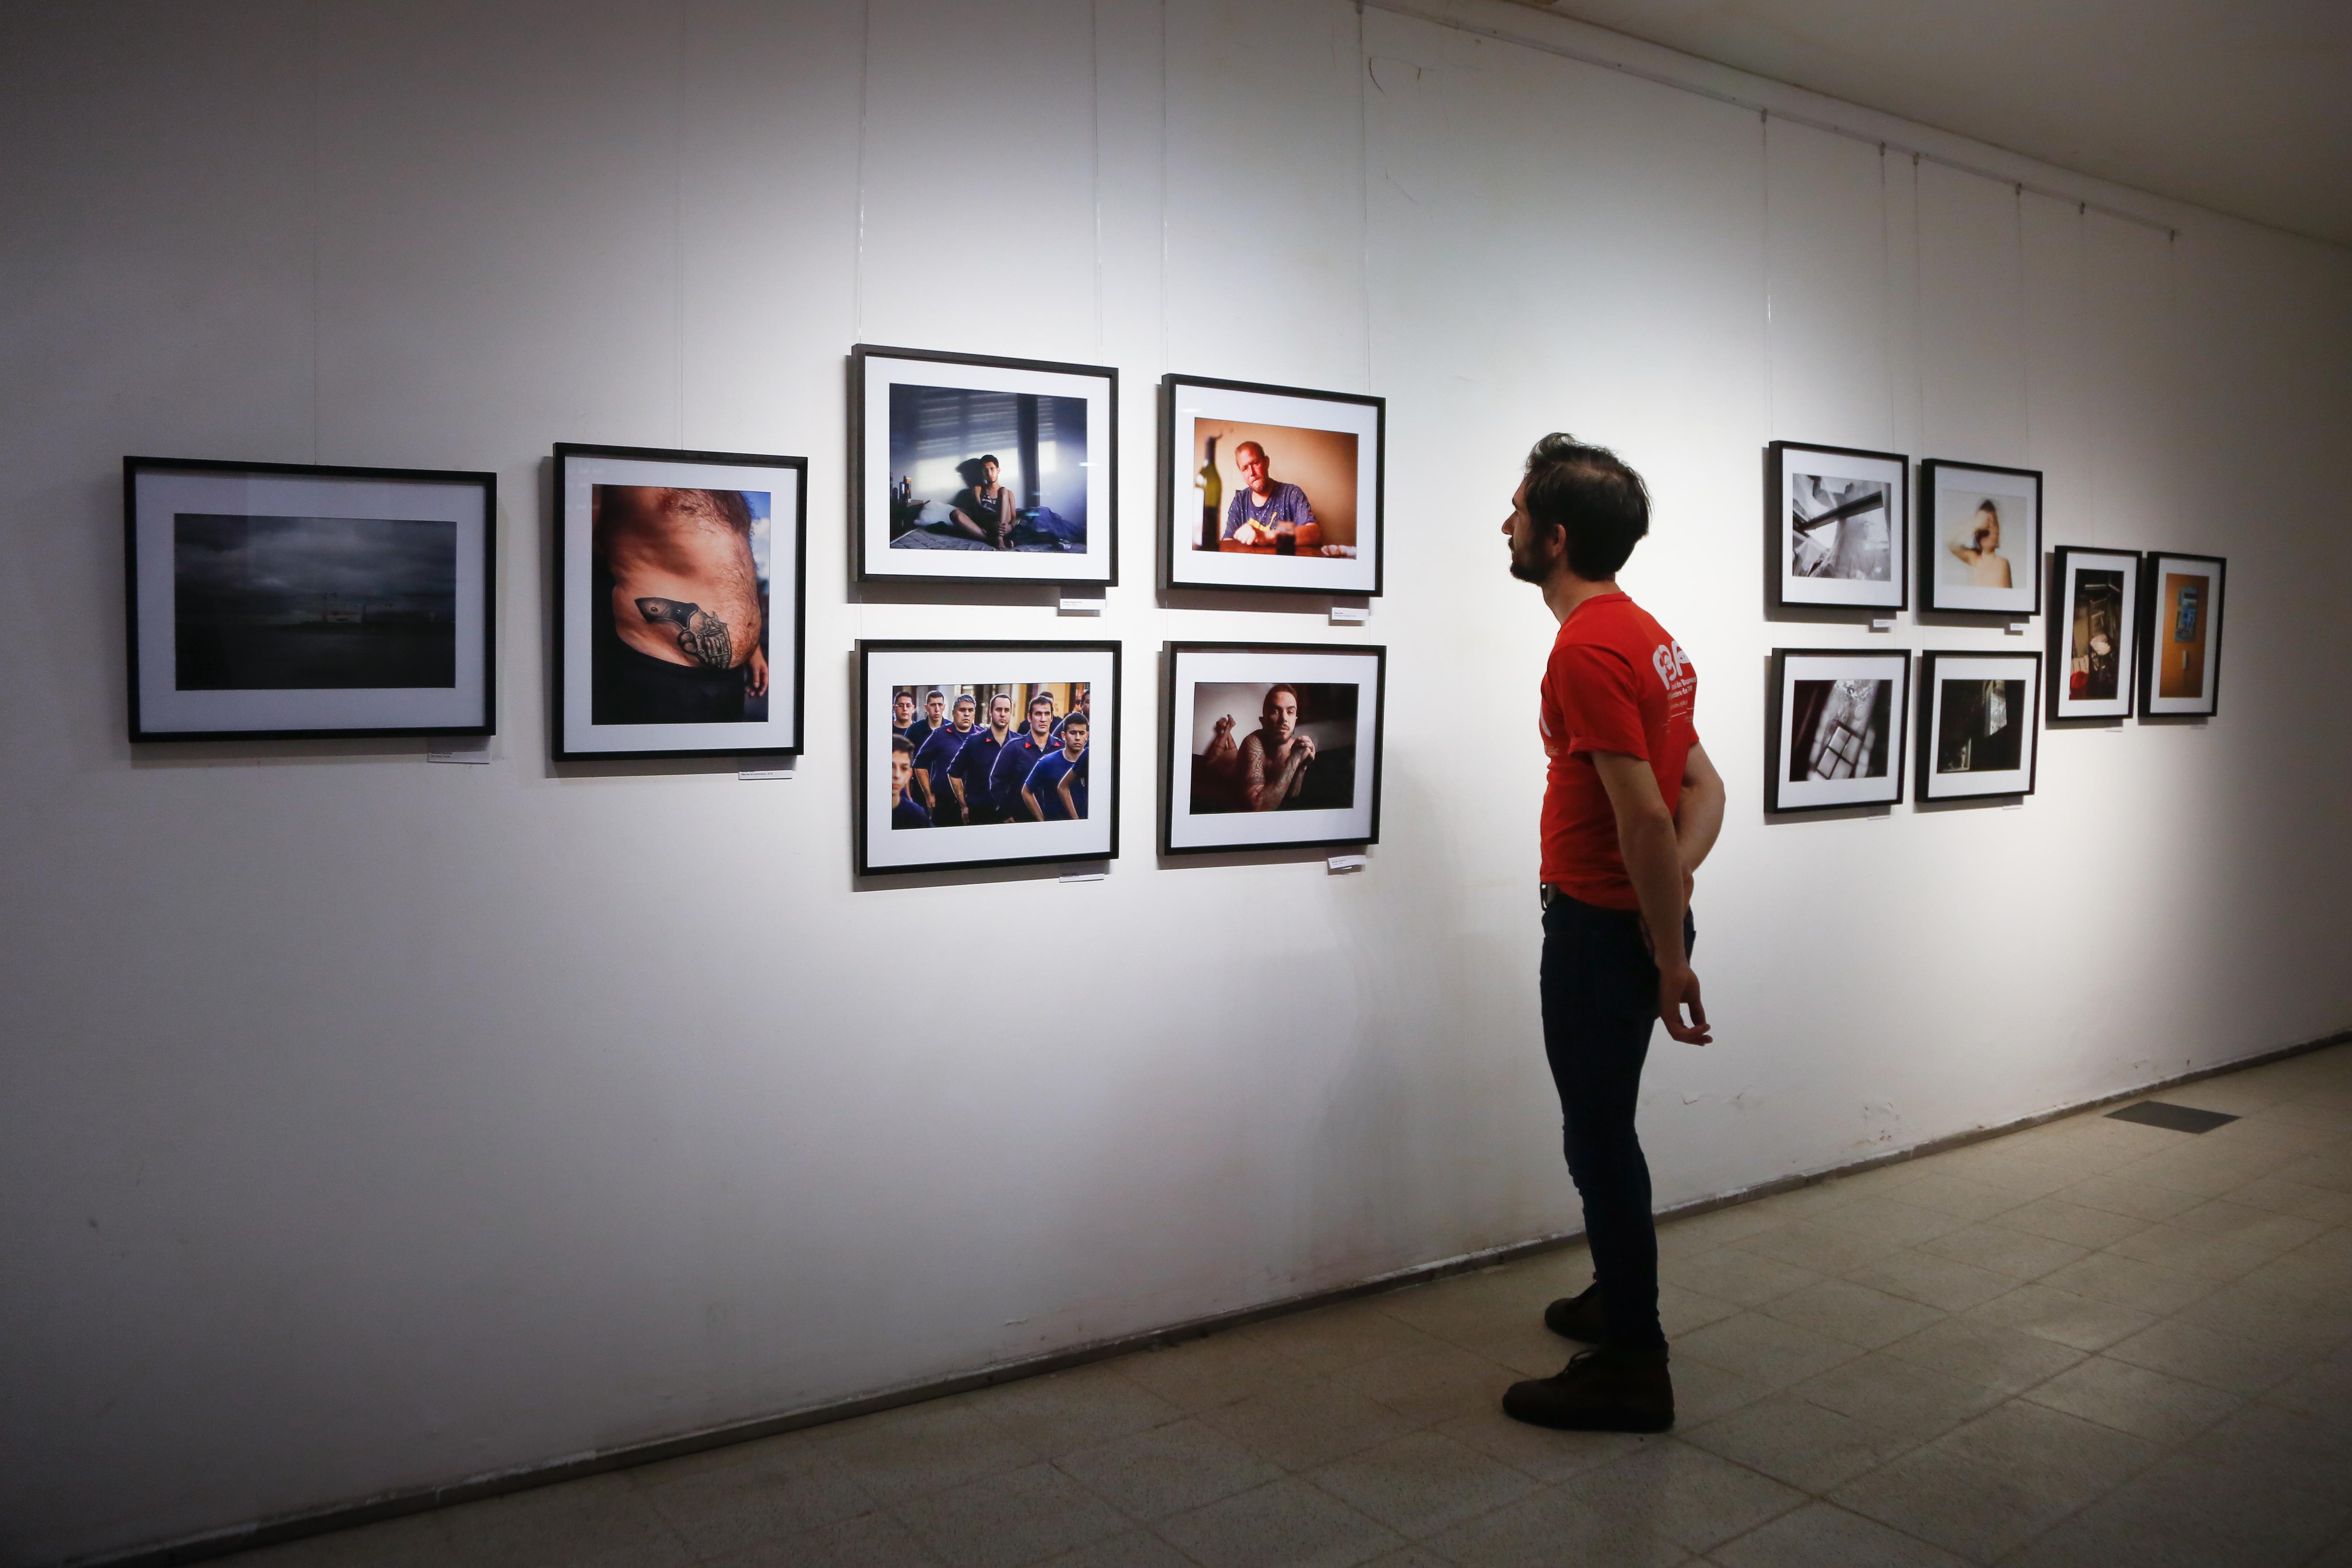 Muestra fotográfica de estudiantes.